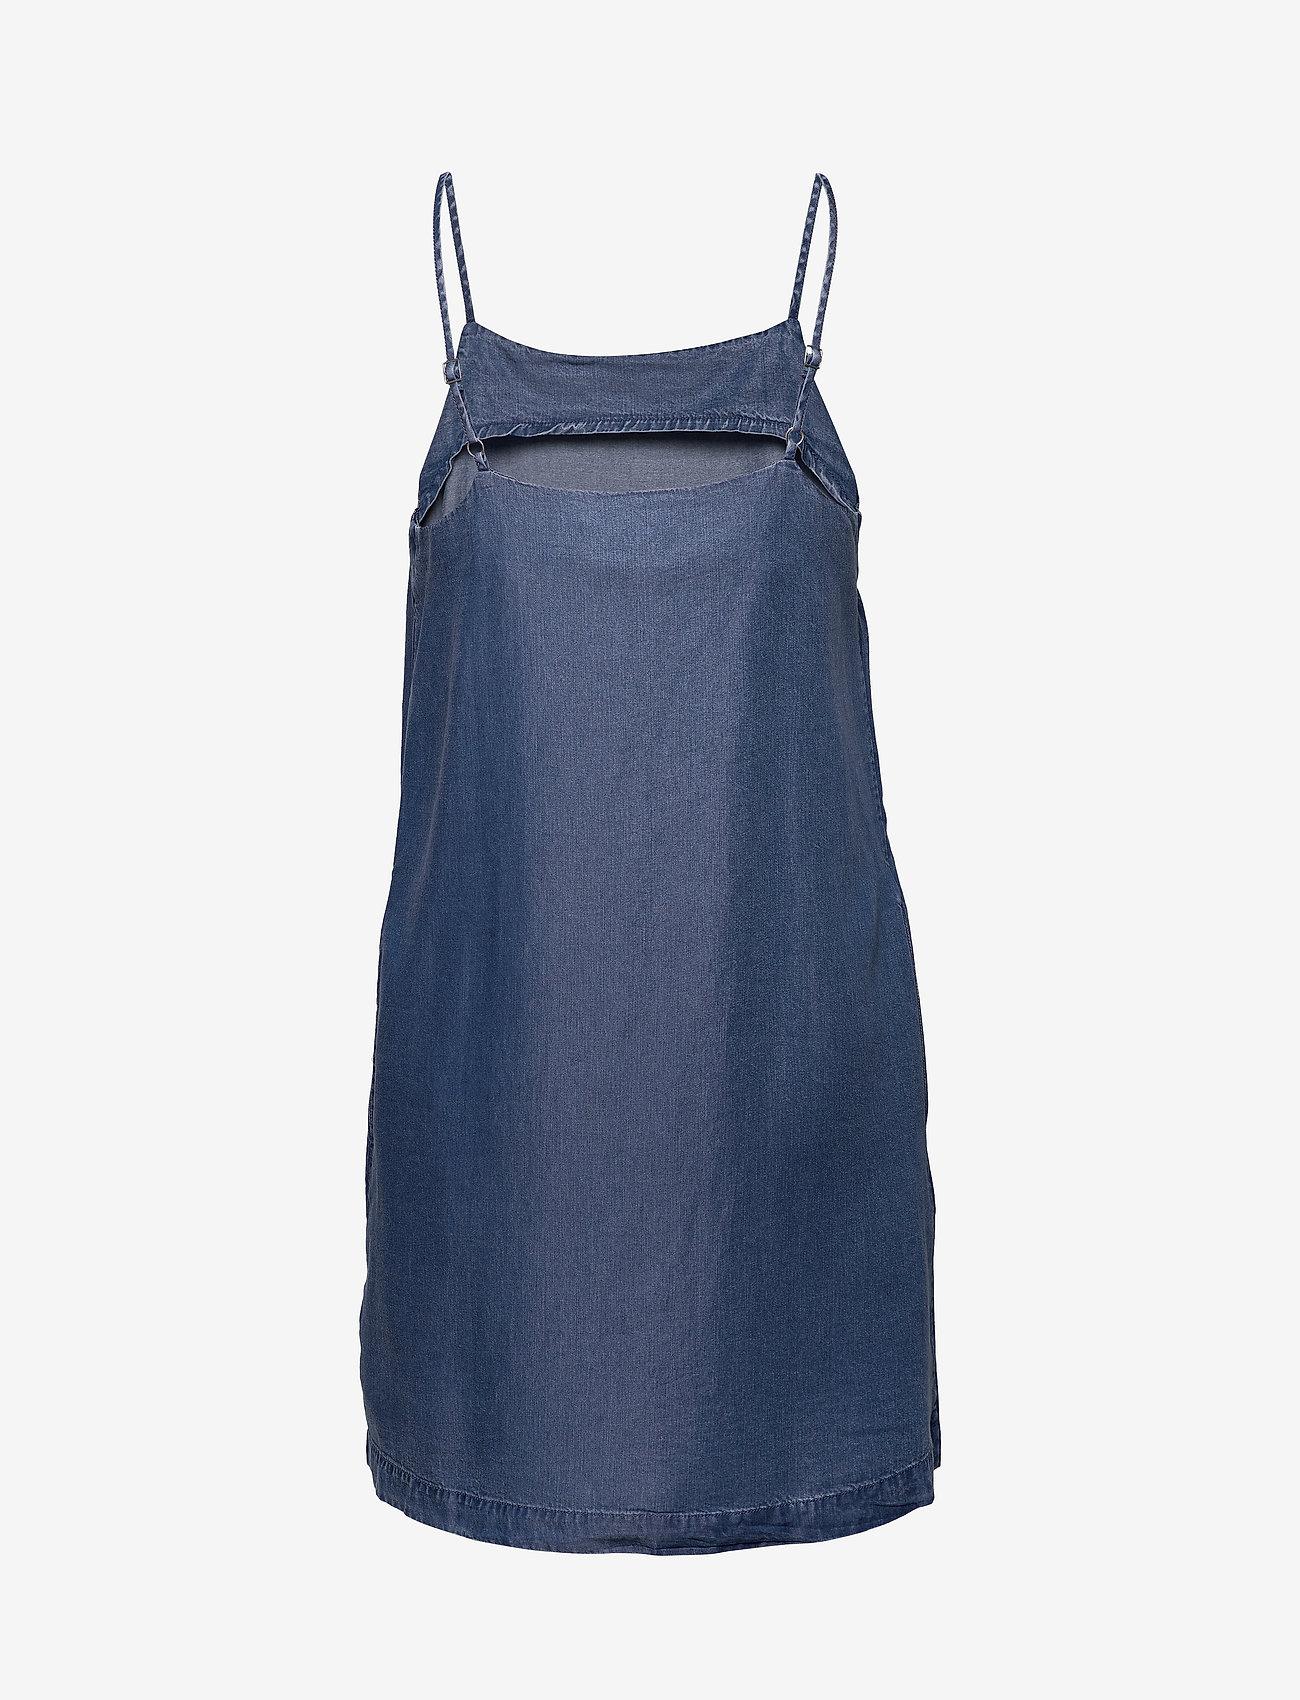 Calvin Klein Jeans - INDIGO TENCEL SLIP DRESS - korte kjoler - mid indigo - 1